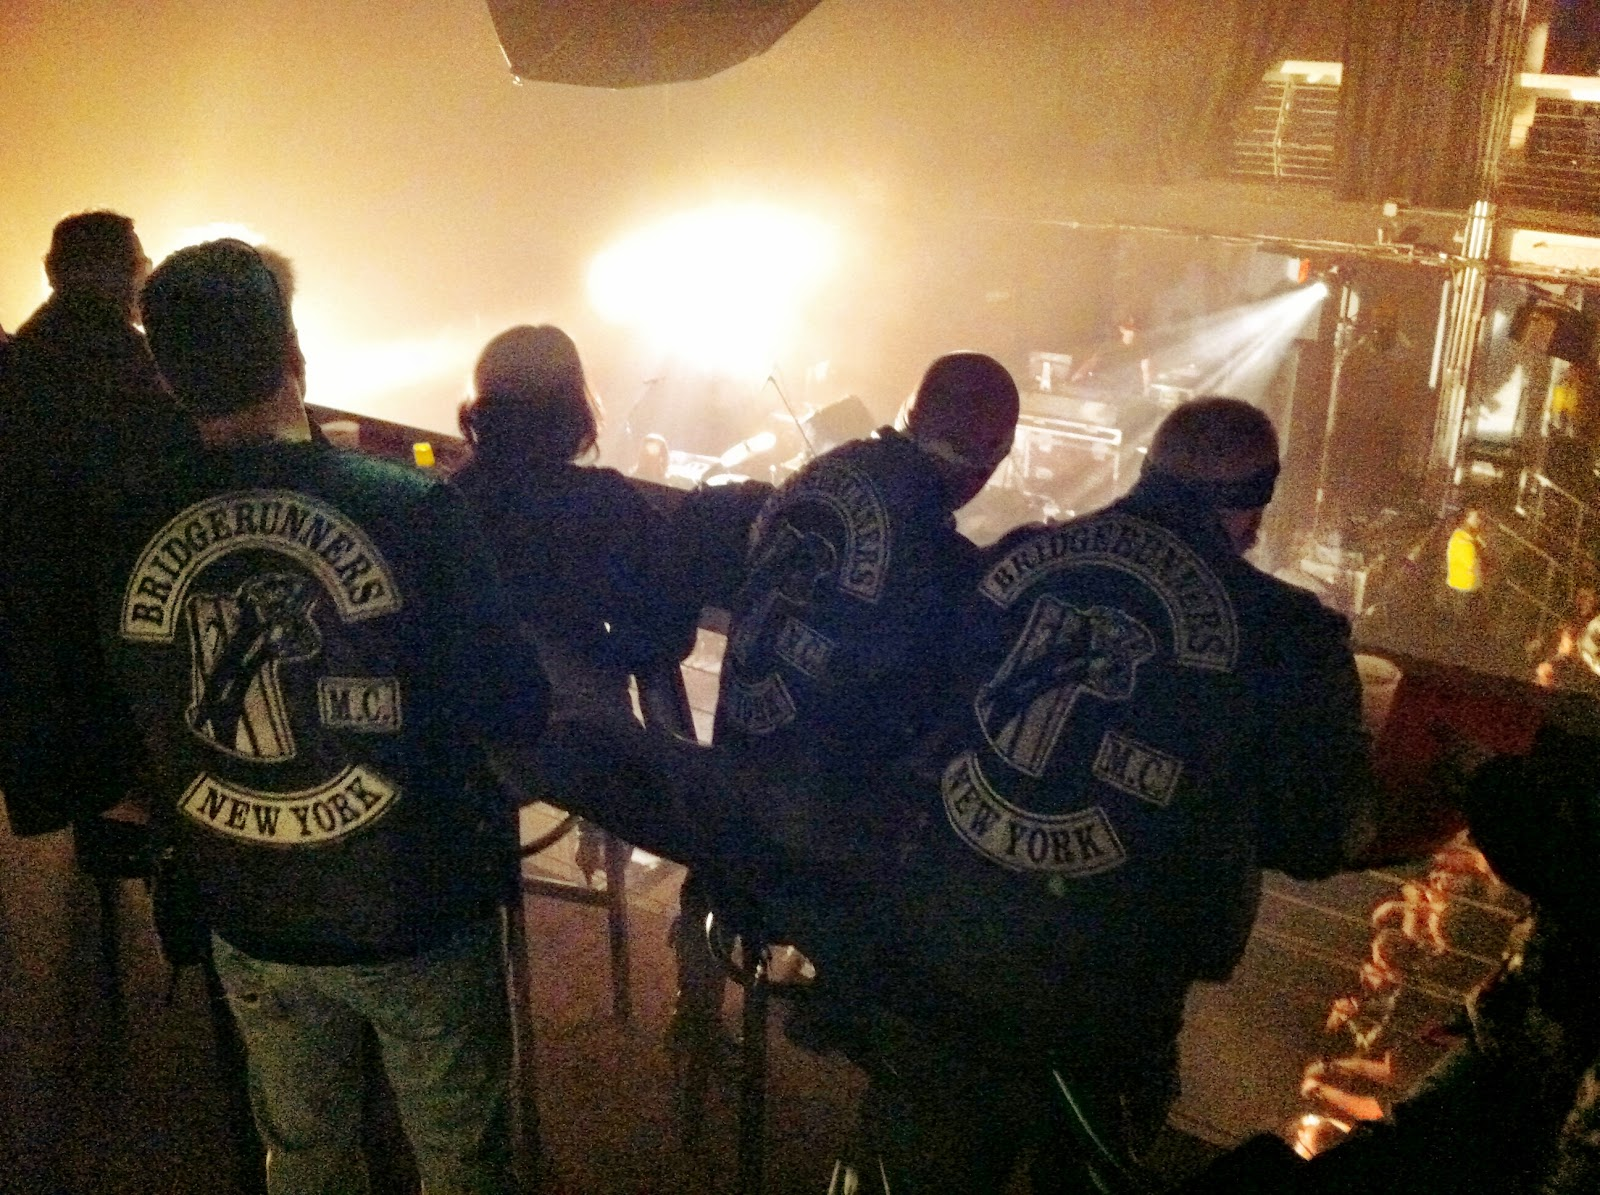 Quooklynite Black Rebel Motorcycle Club Terminal 5